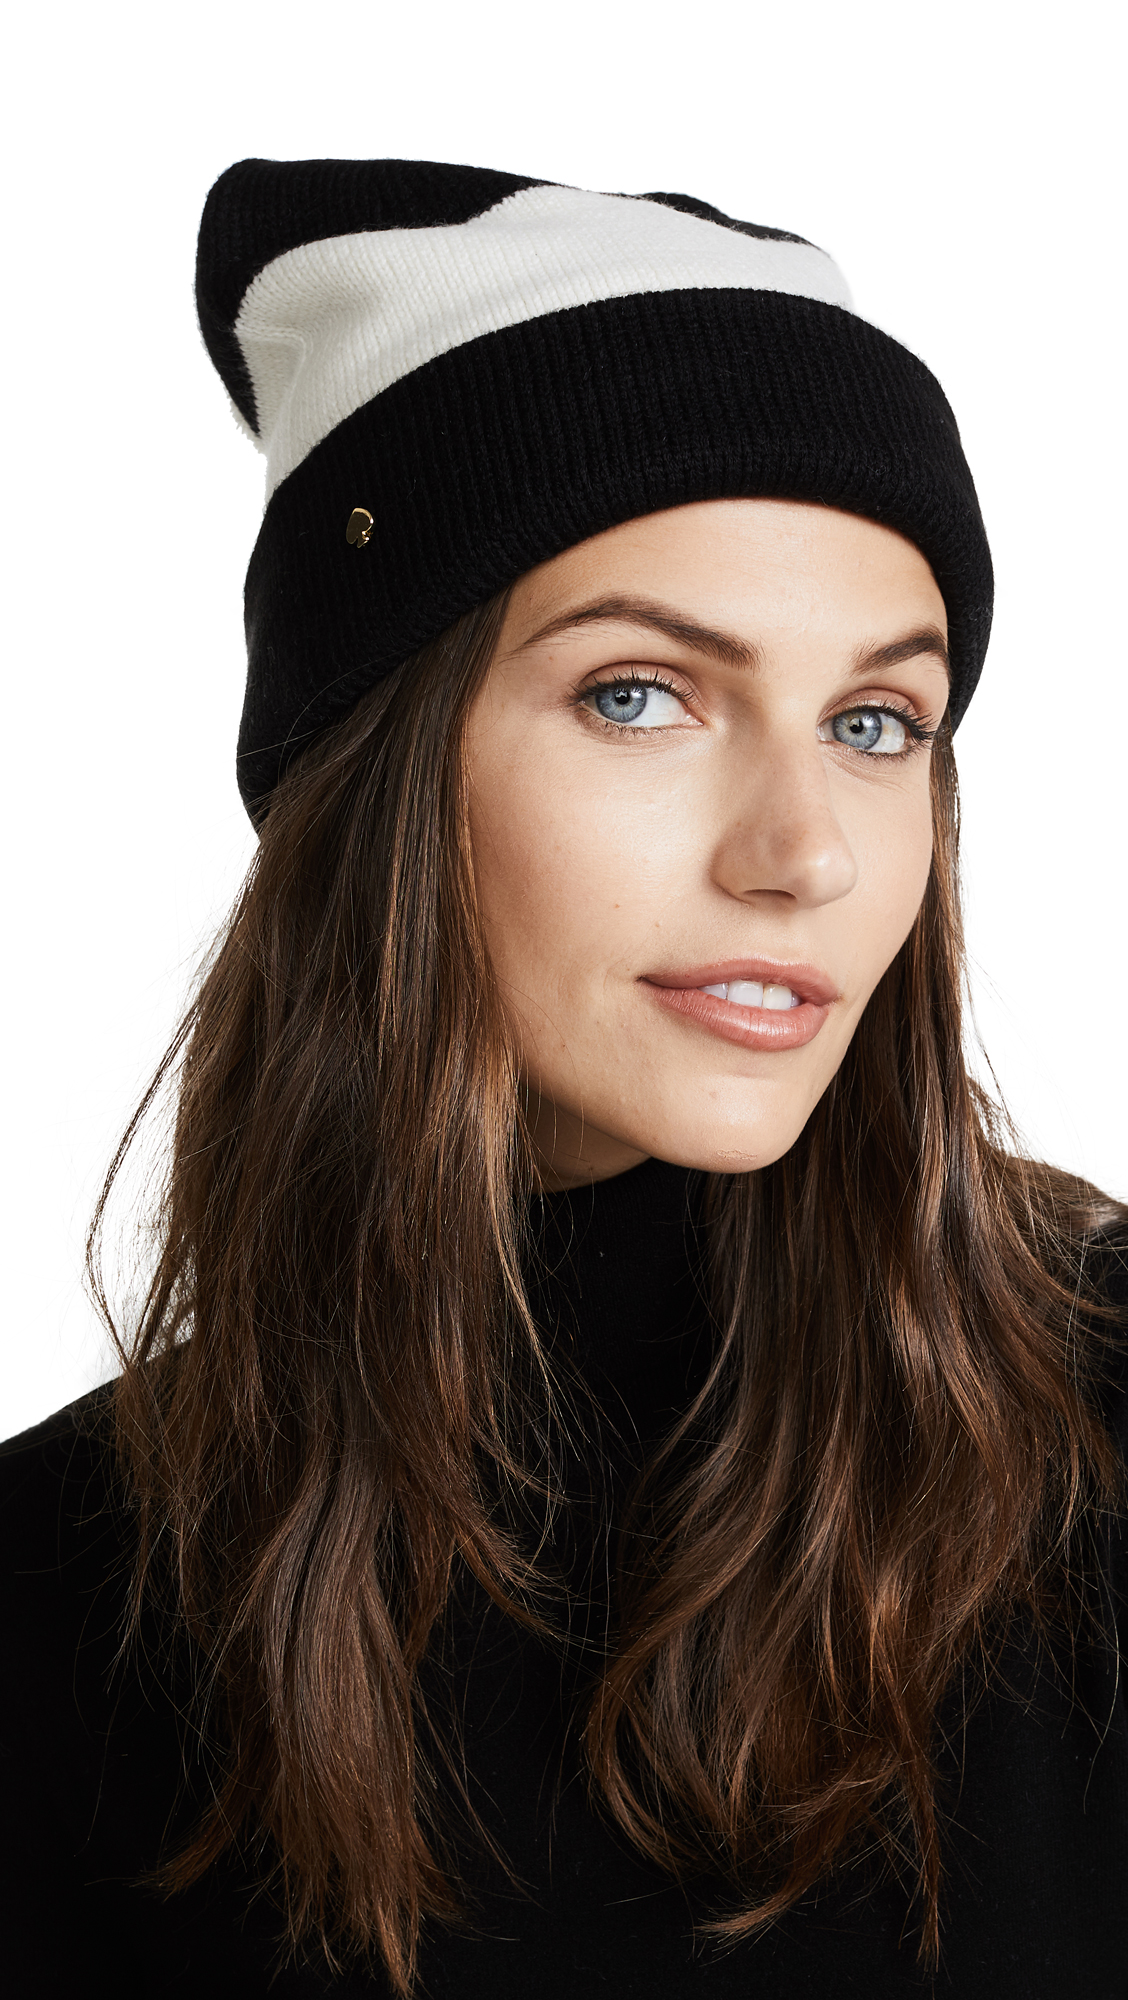 Kate Spade New York Stripe Beanie - Cream/Black